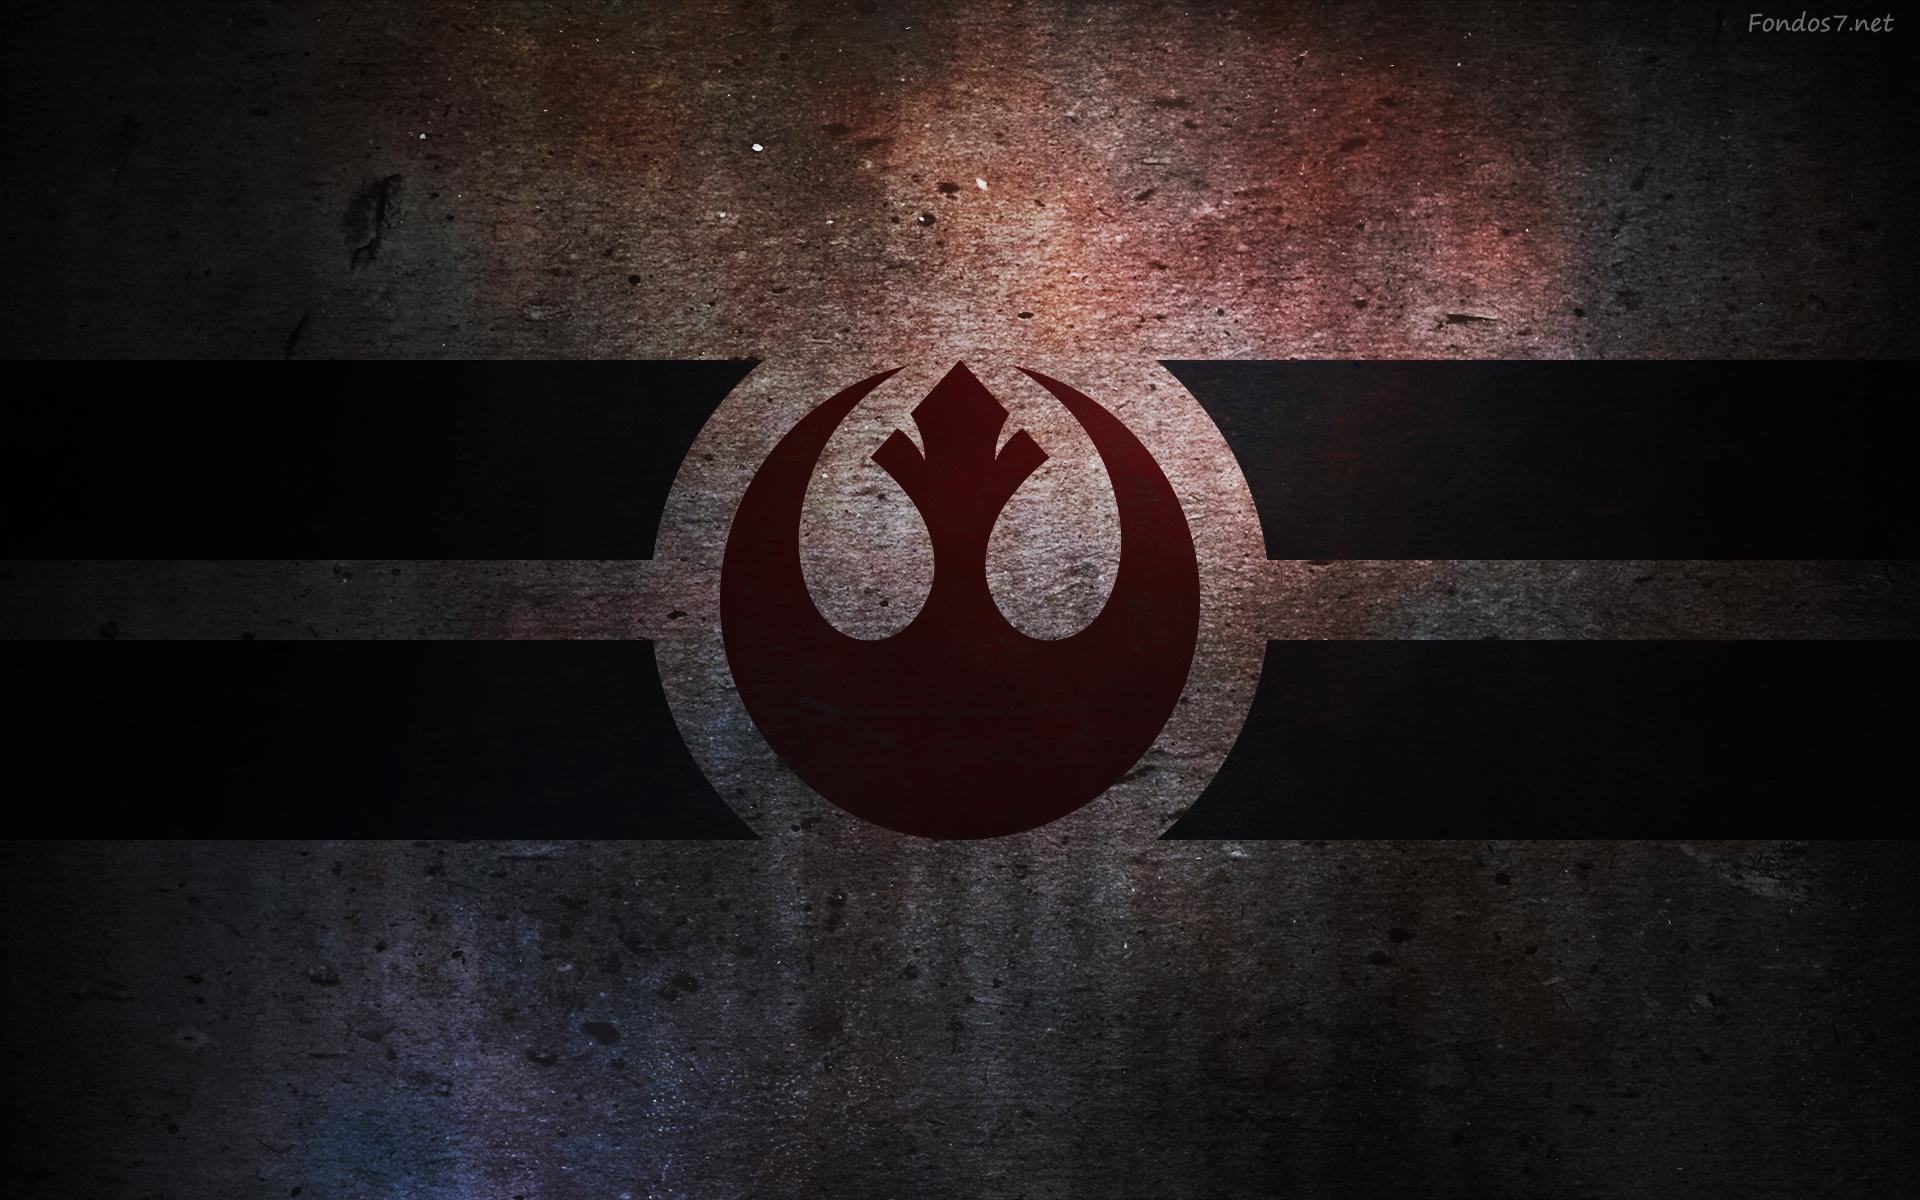 Wallpapers de Star Wars HD   Taringa 1920x1200